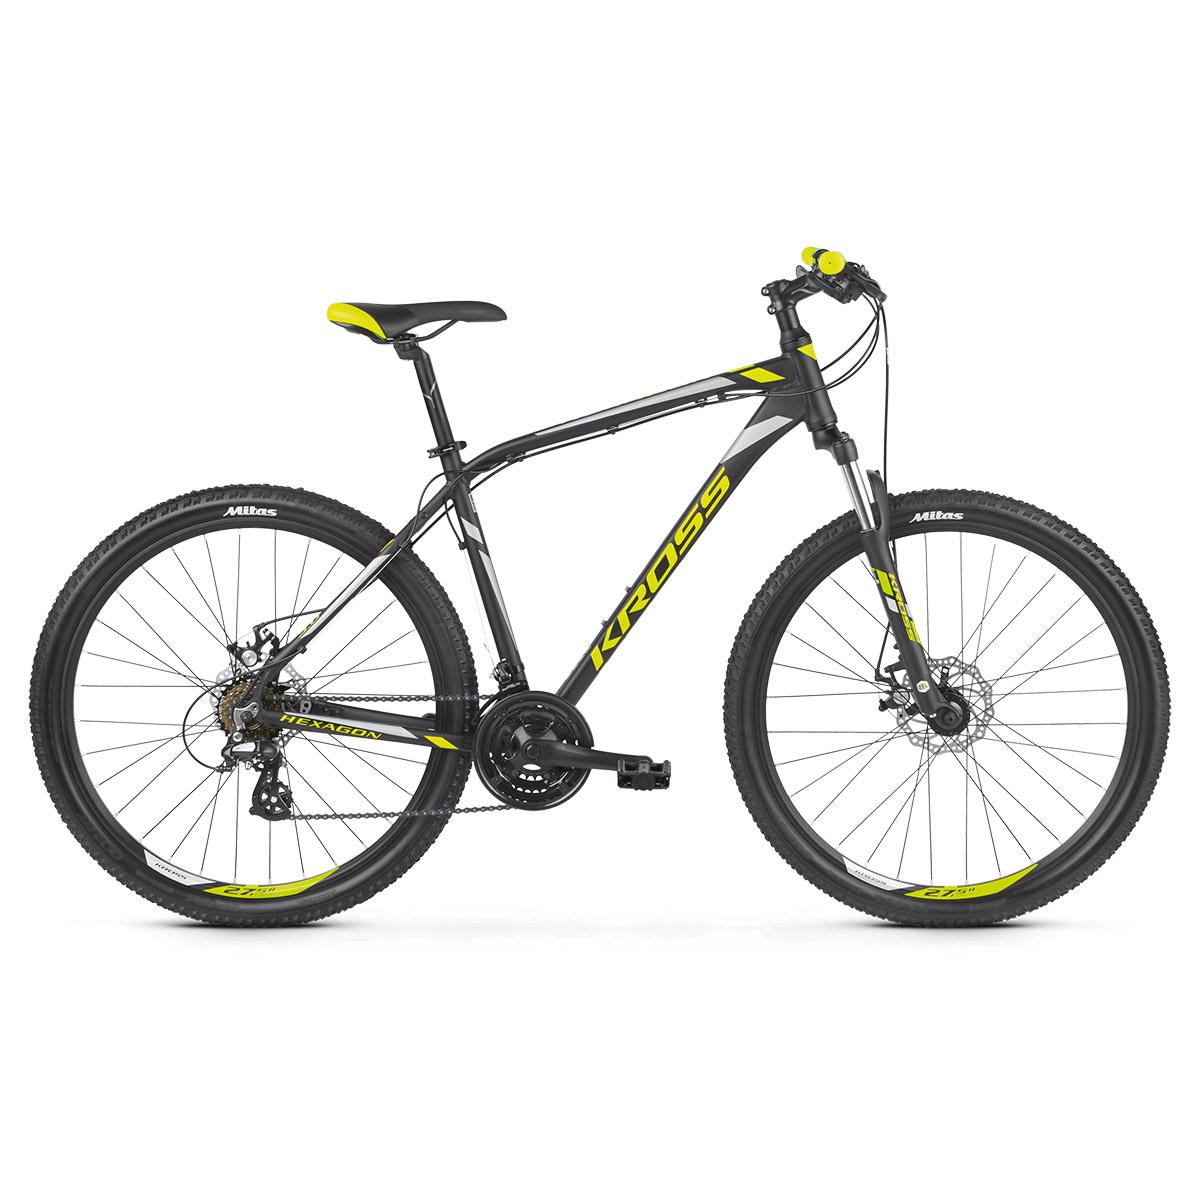 Rower Kross Hexagon 3.0 2019  - rowery MTB Rekreacja - Rowerowy Sam